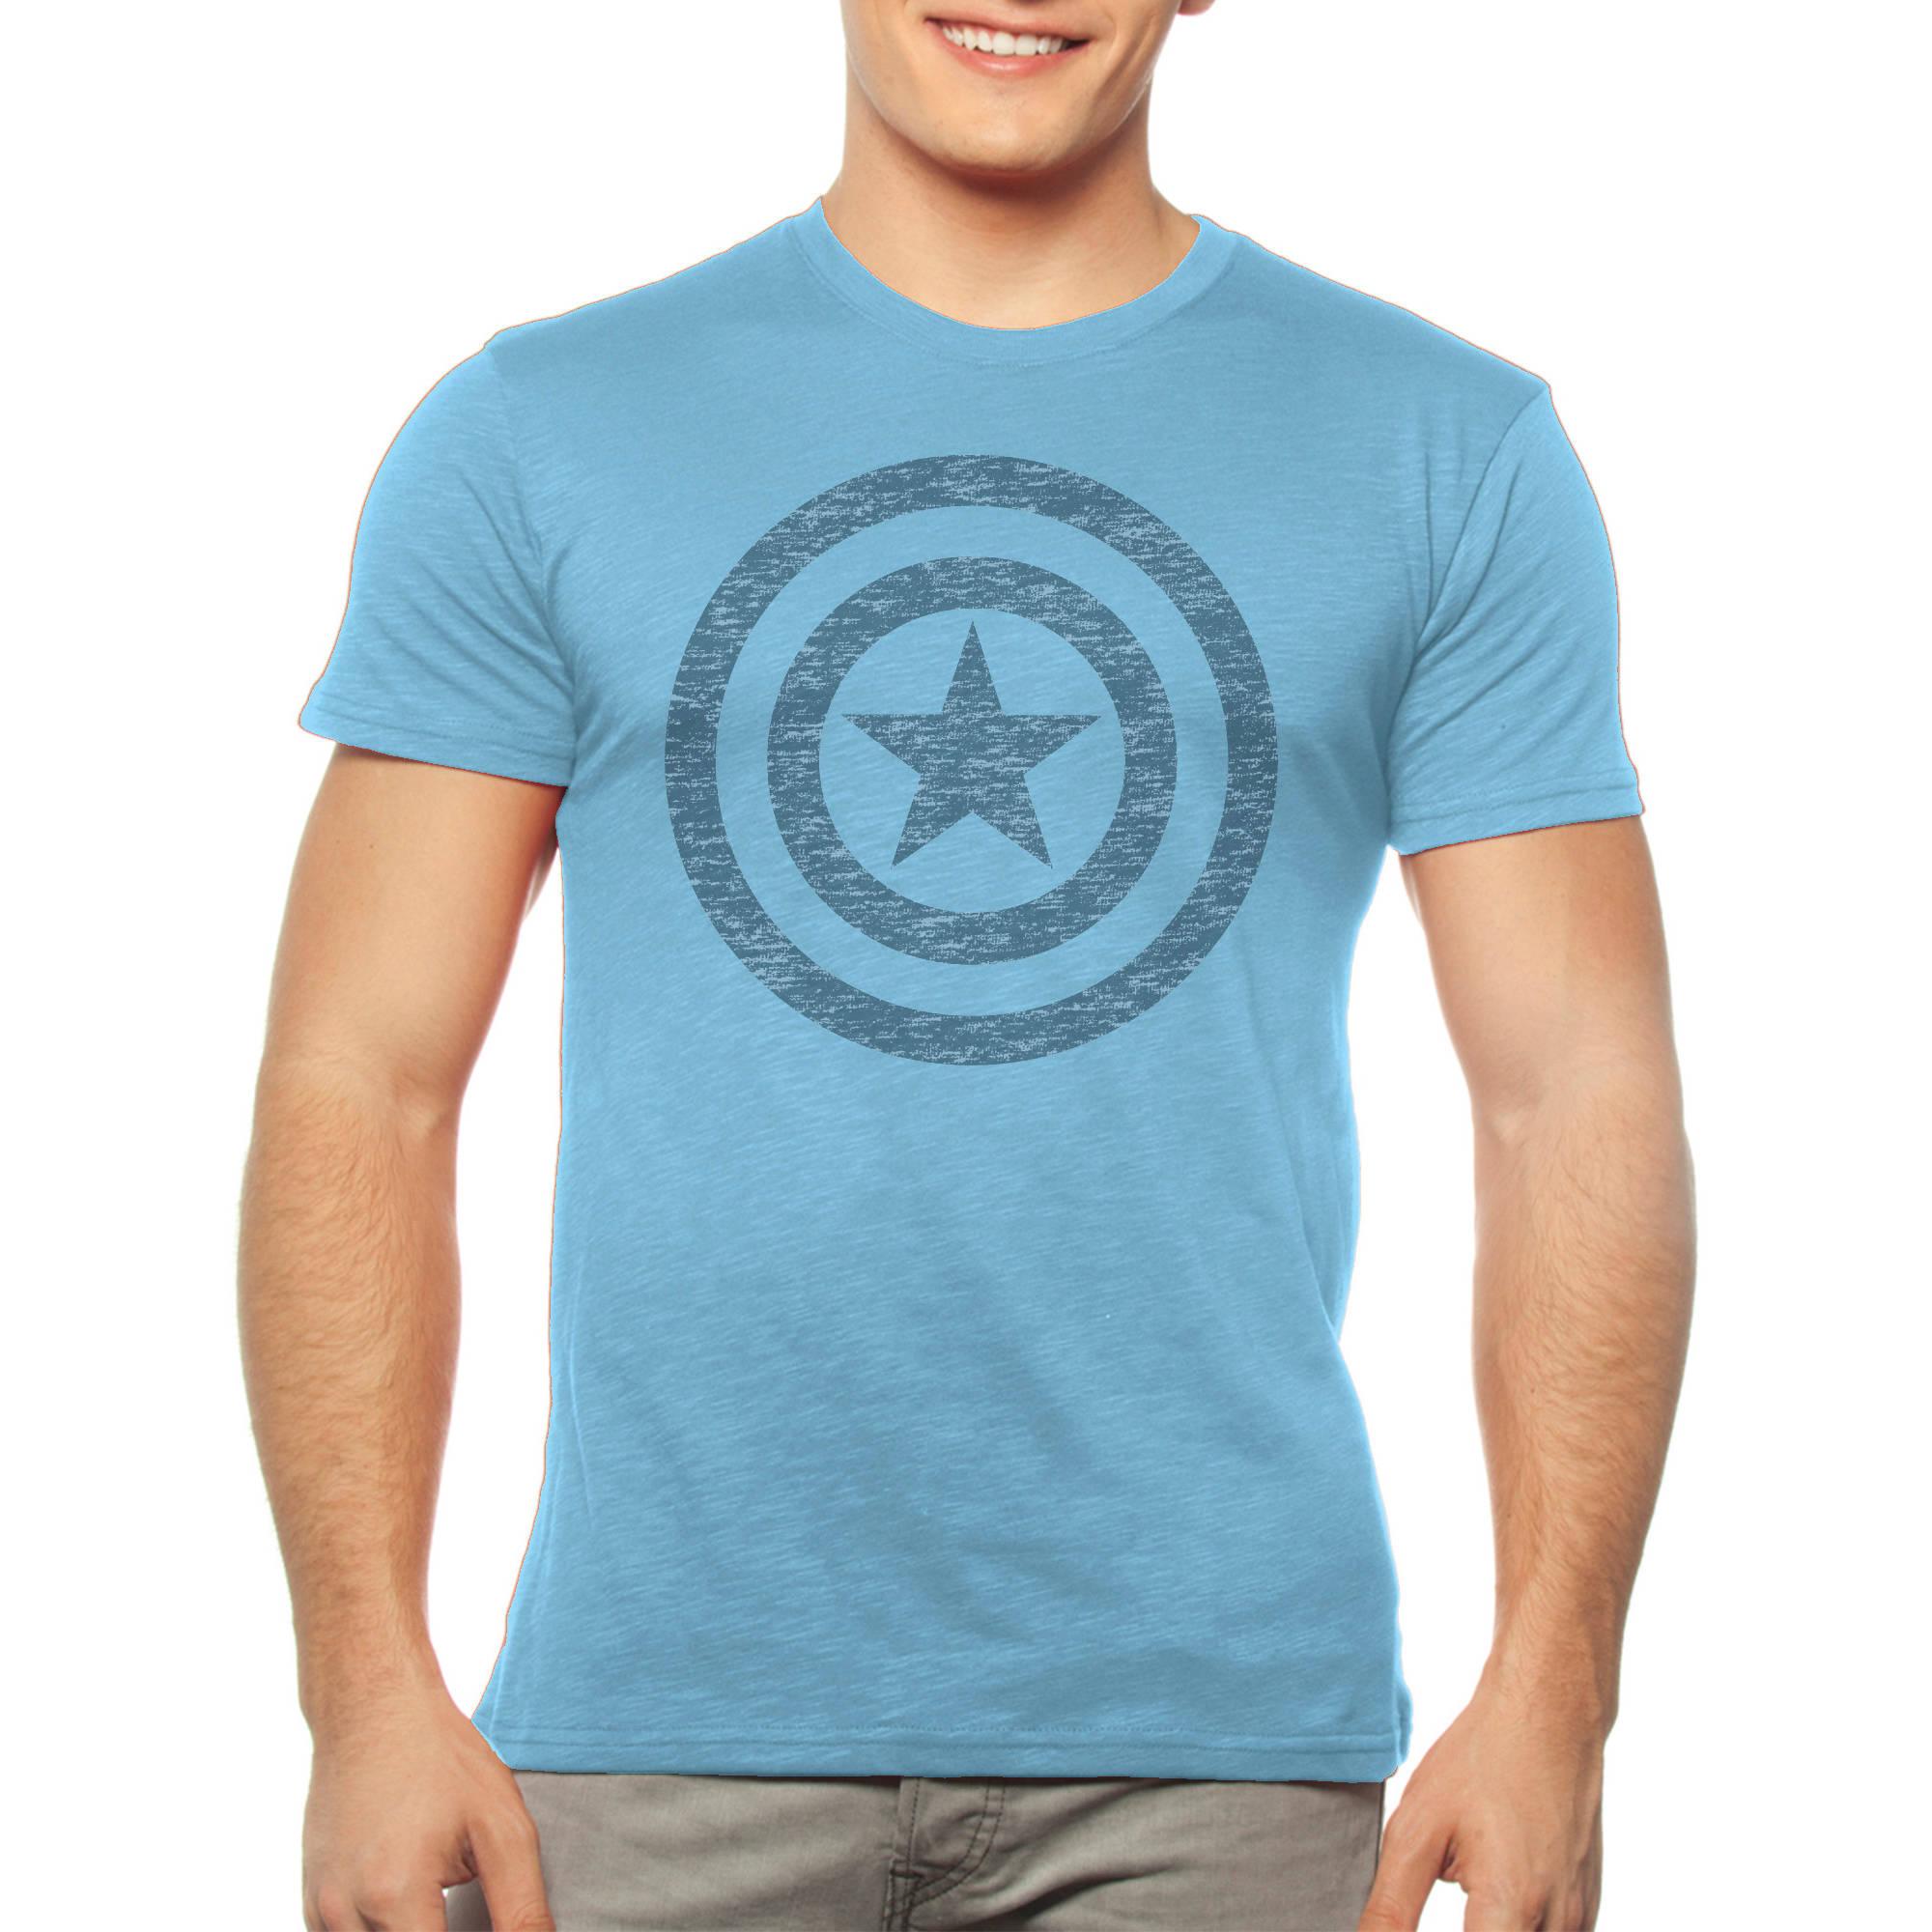 Marvel Big Men's Captain America Shield Logo Short Sleeve Graphic Tee, 2XL